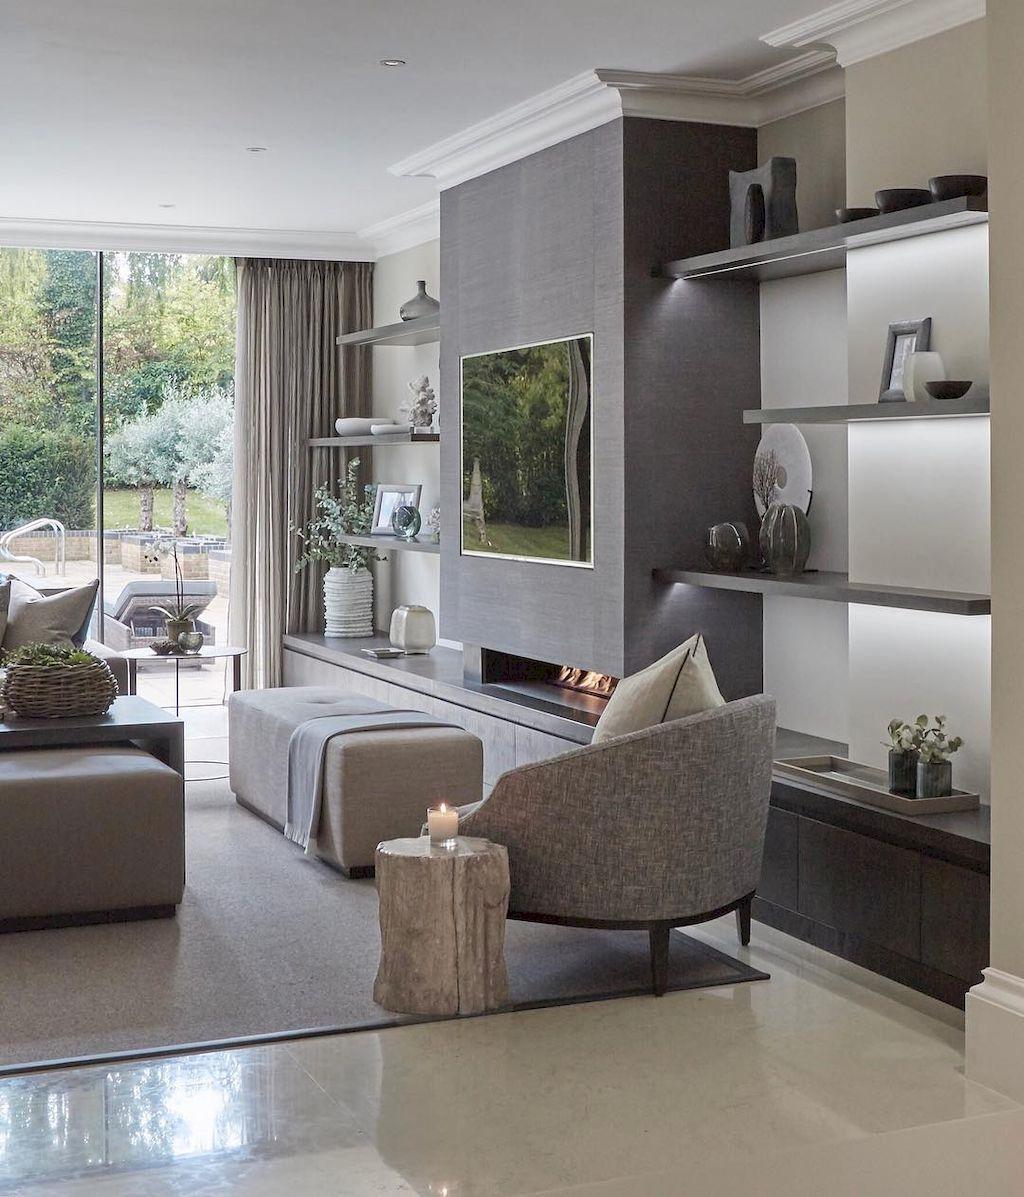 Inspired tv wall living room ideas (7   home decor   Pinterest